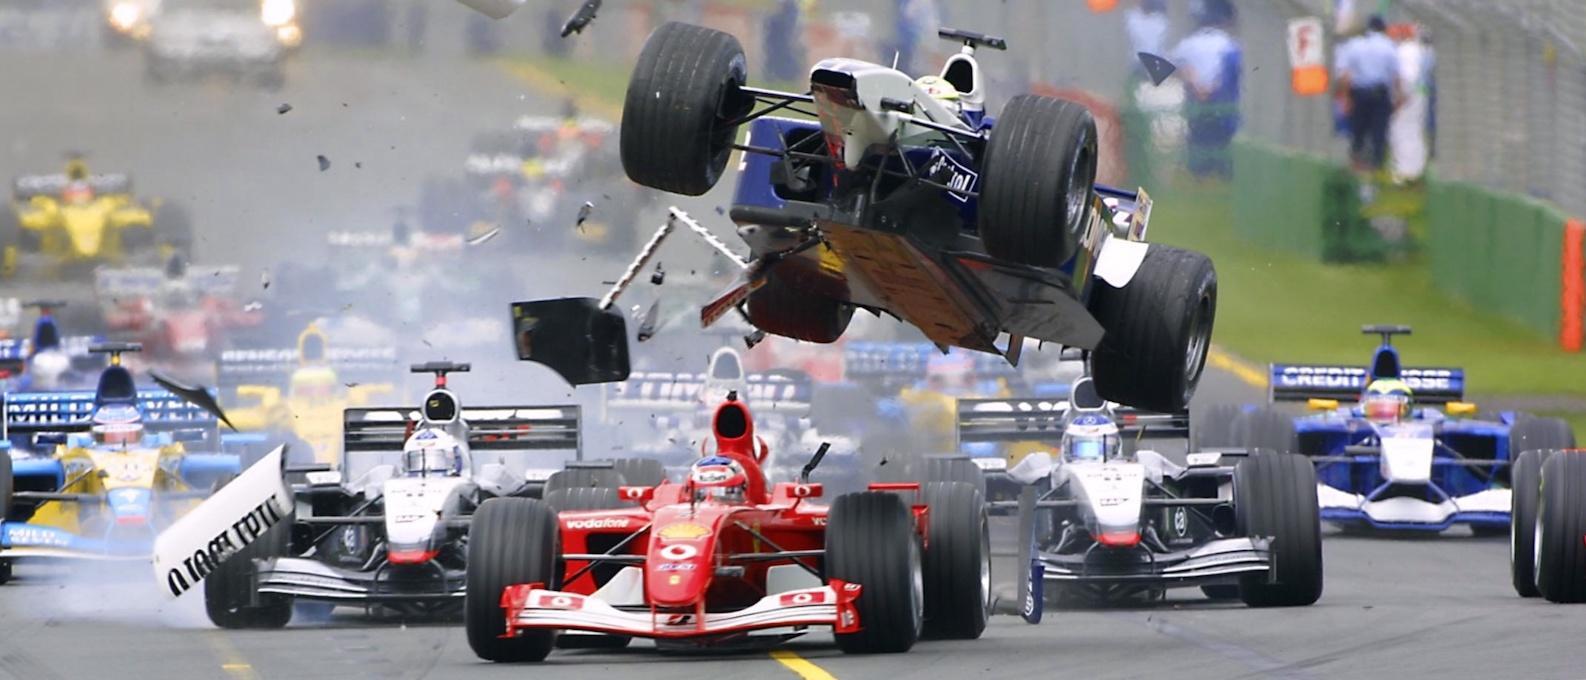 LAT Archive: Melbourne's time hosting the Australian Grand Prix